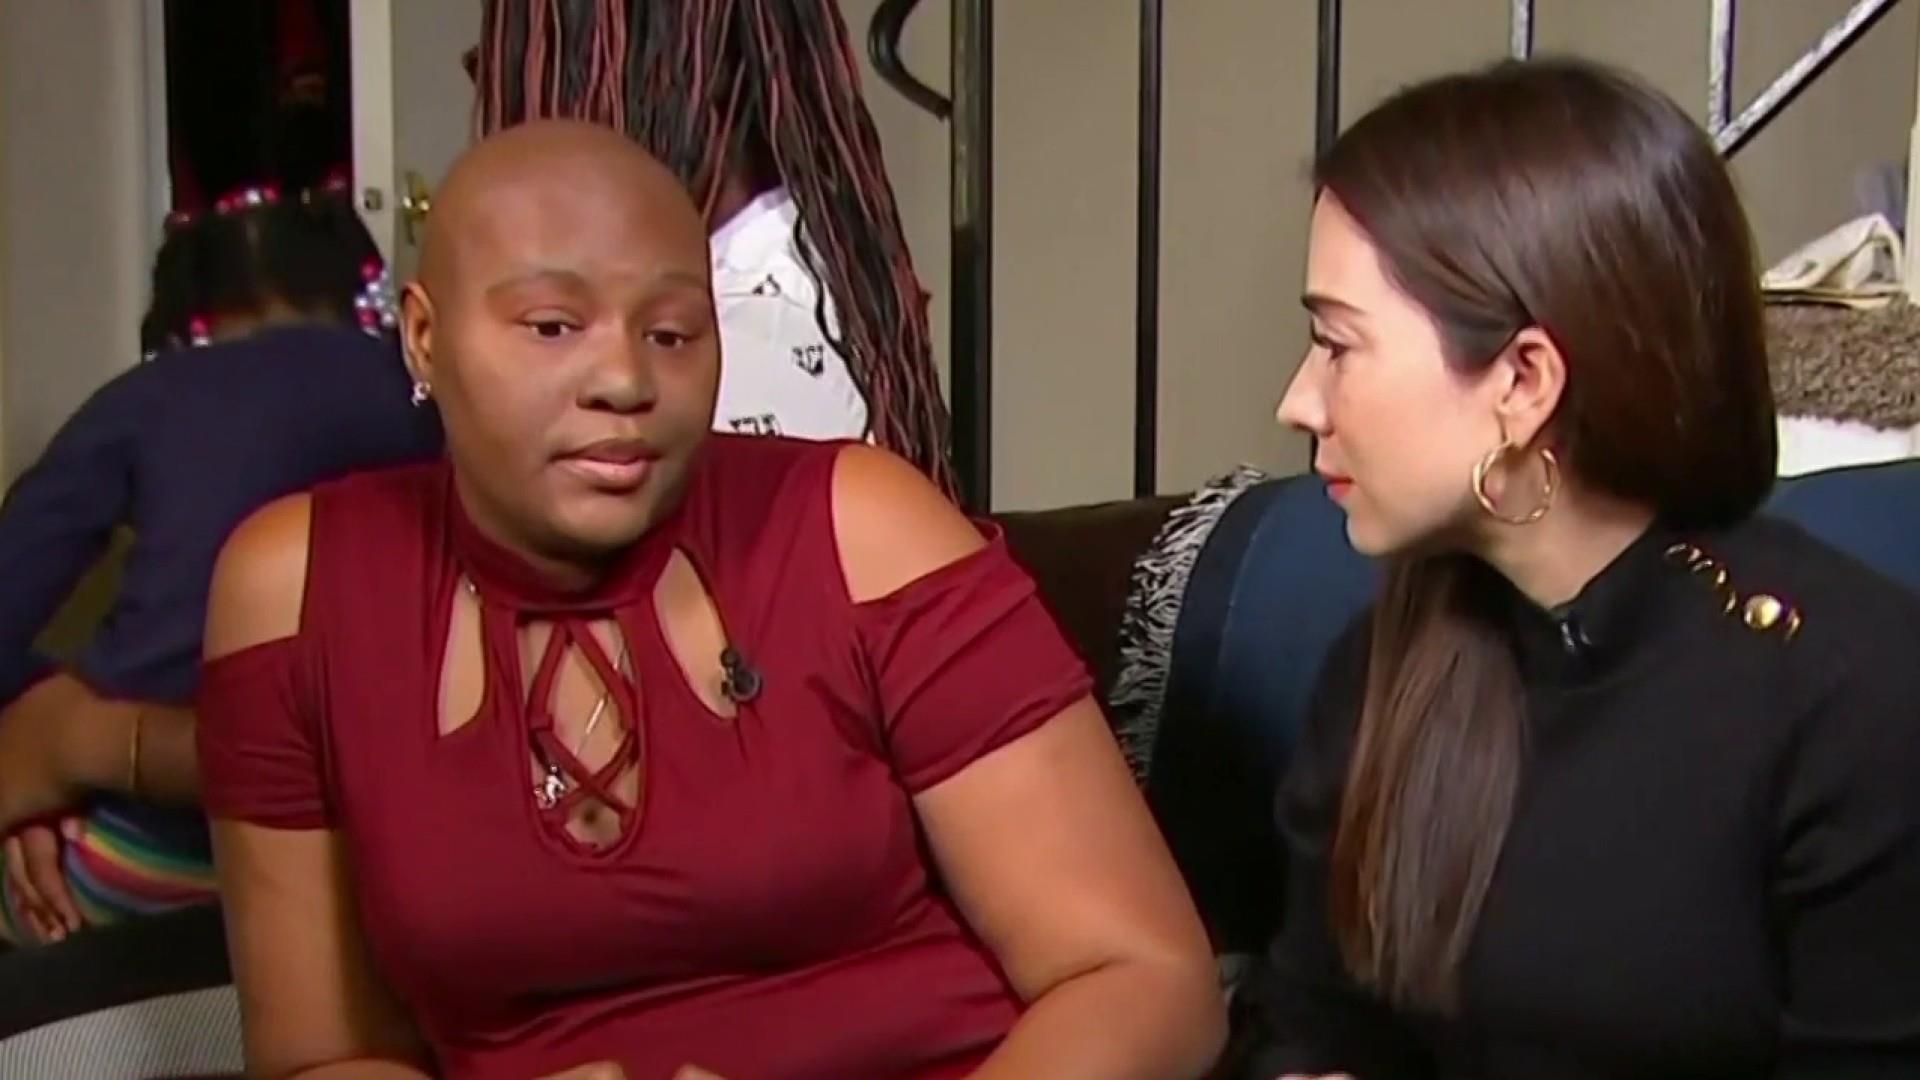 #GoodNewsRUHLES: Good Samaritan helps furloughed cancer patient